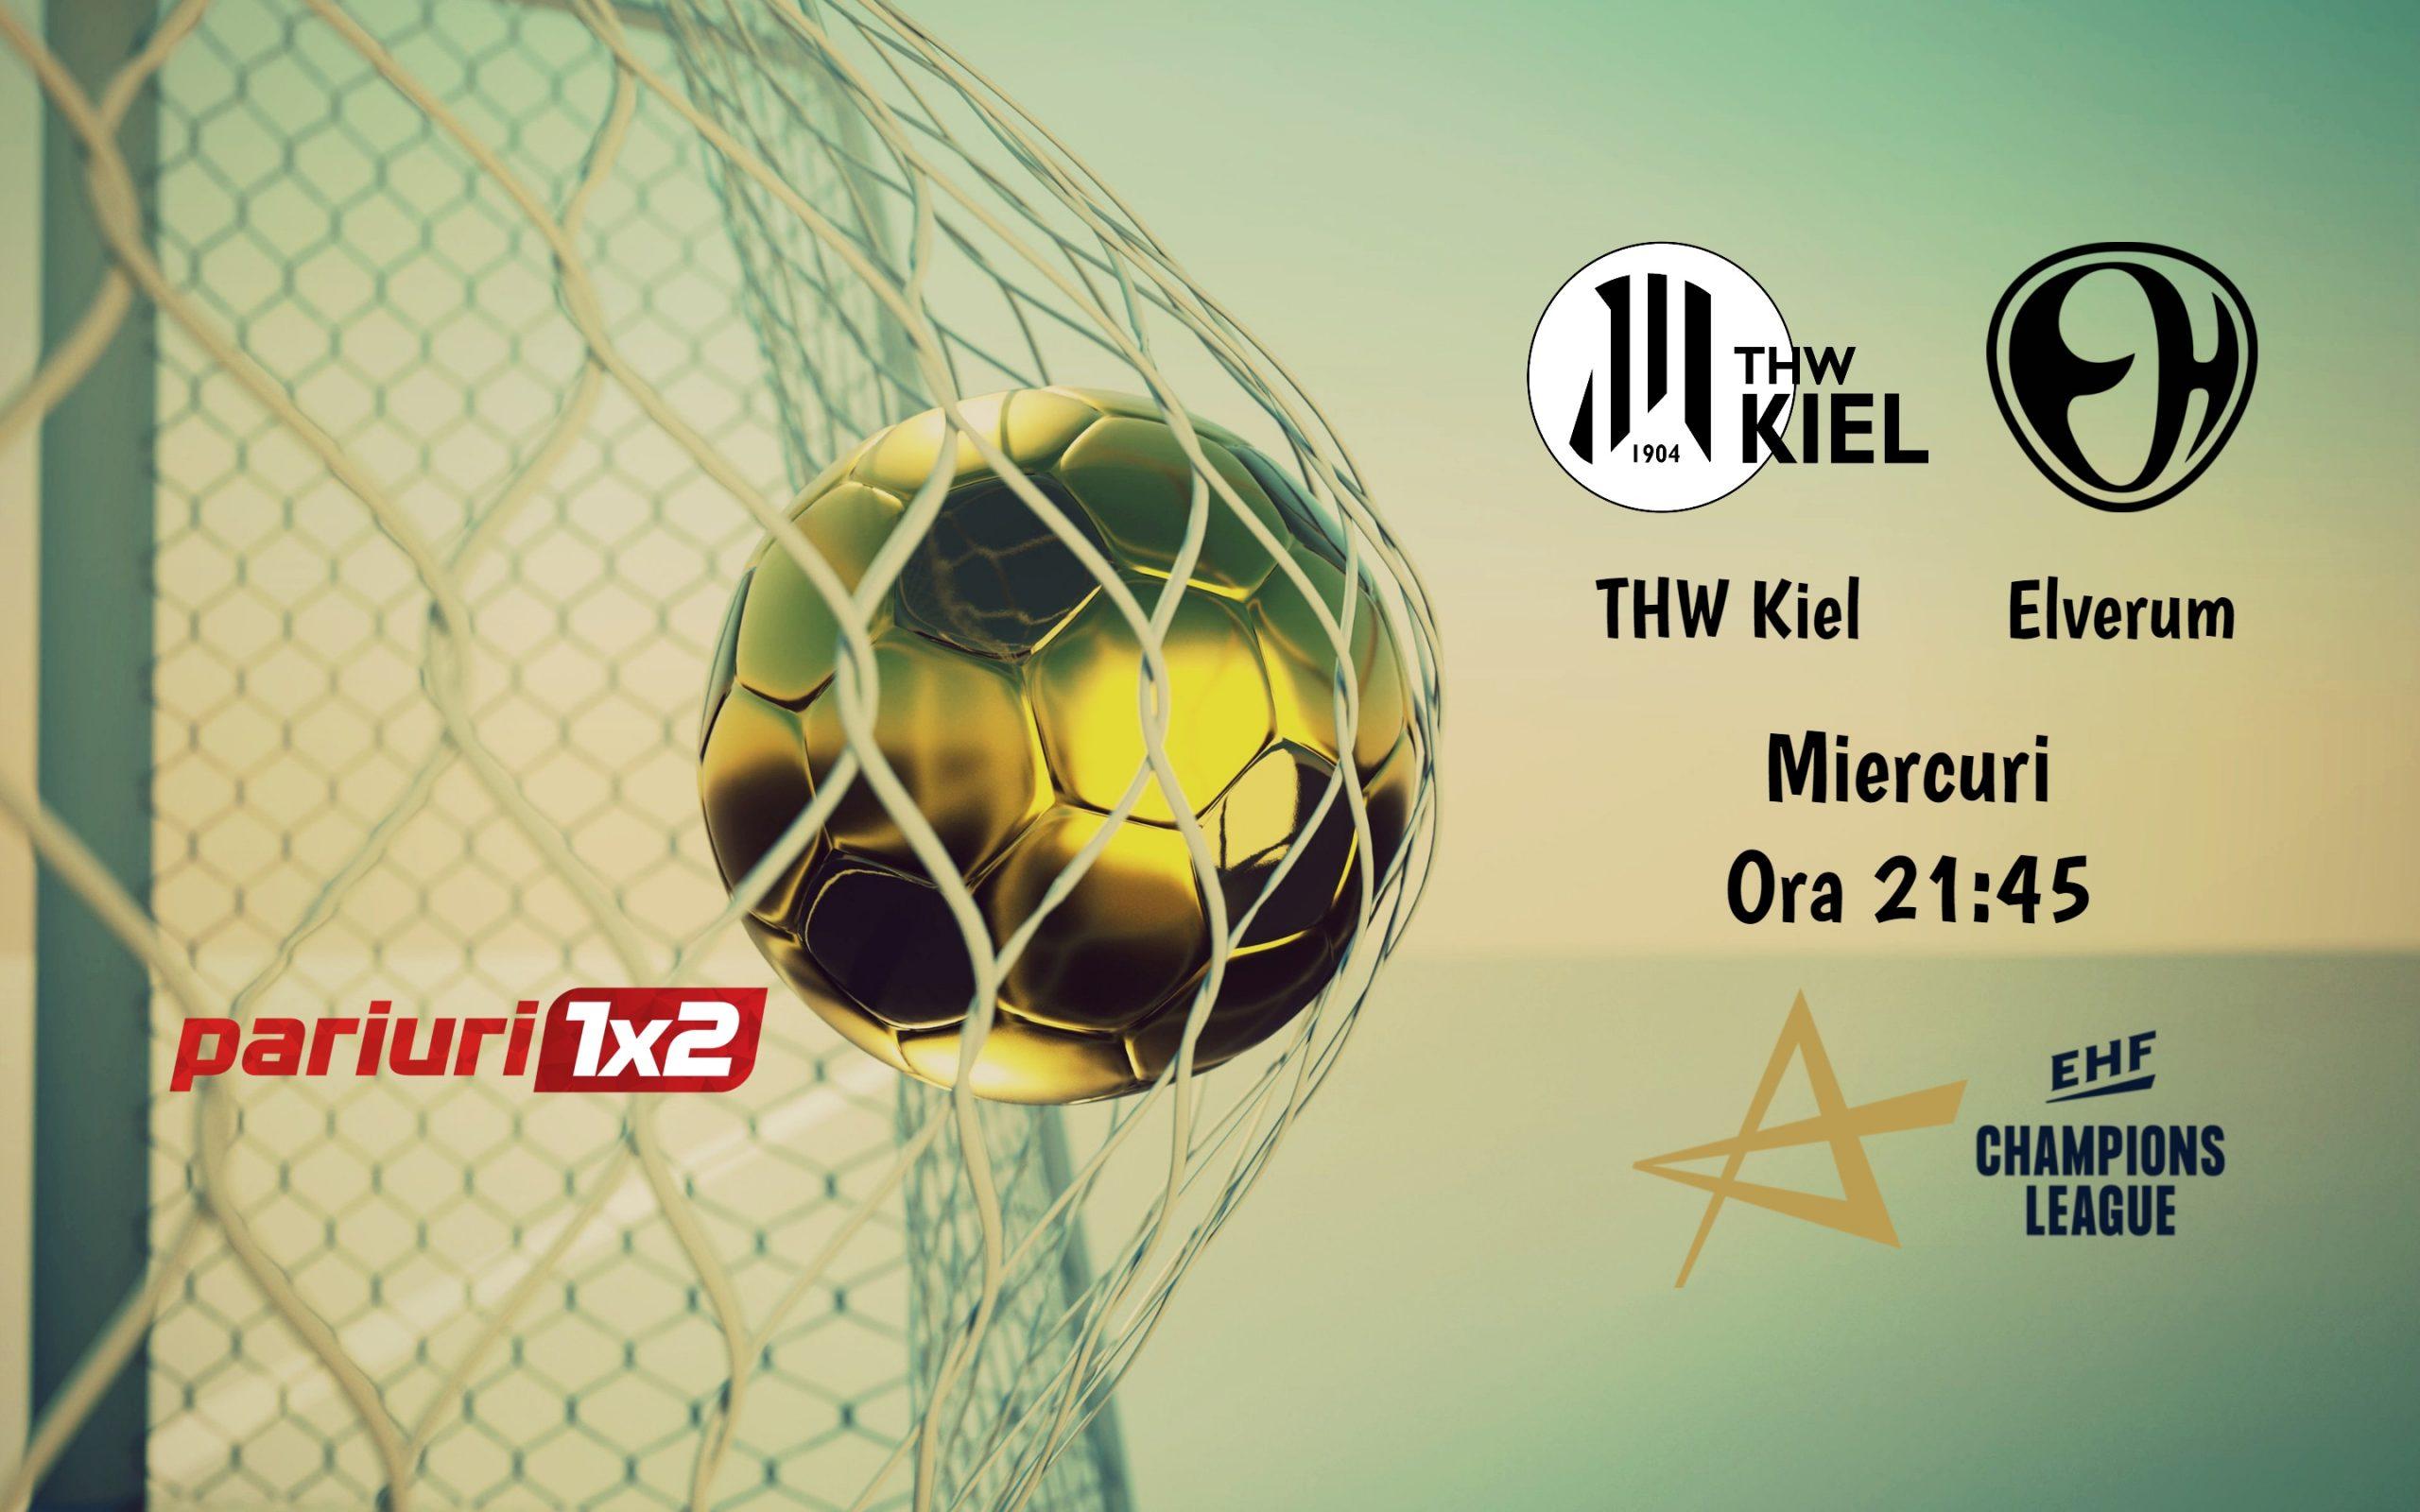 Pariuri handbal » Kiel – Elverum: Misiune facila pentru campioana din 2020!